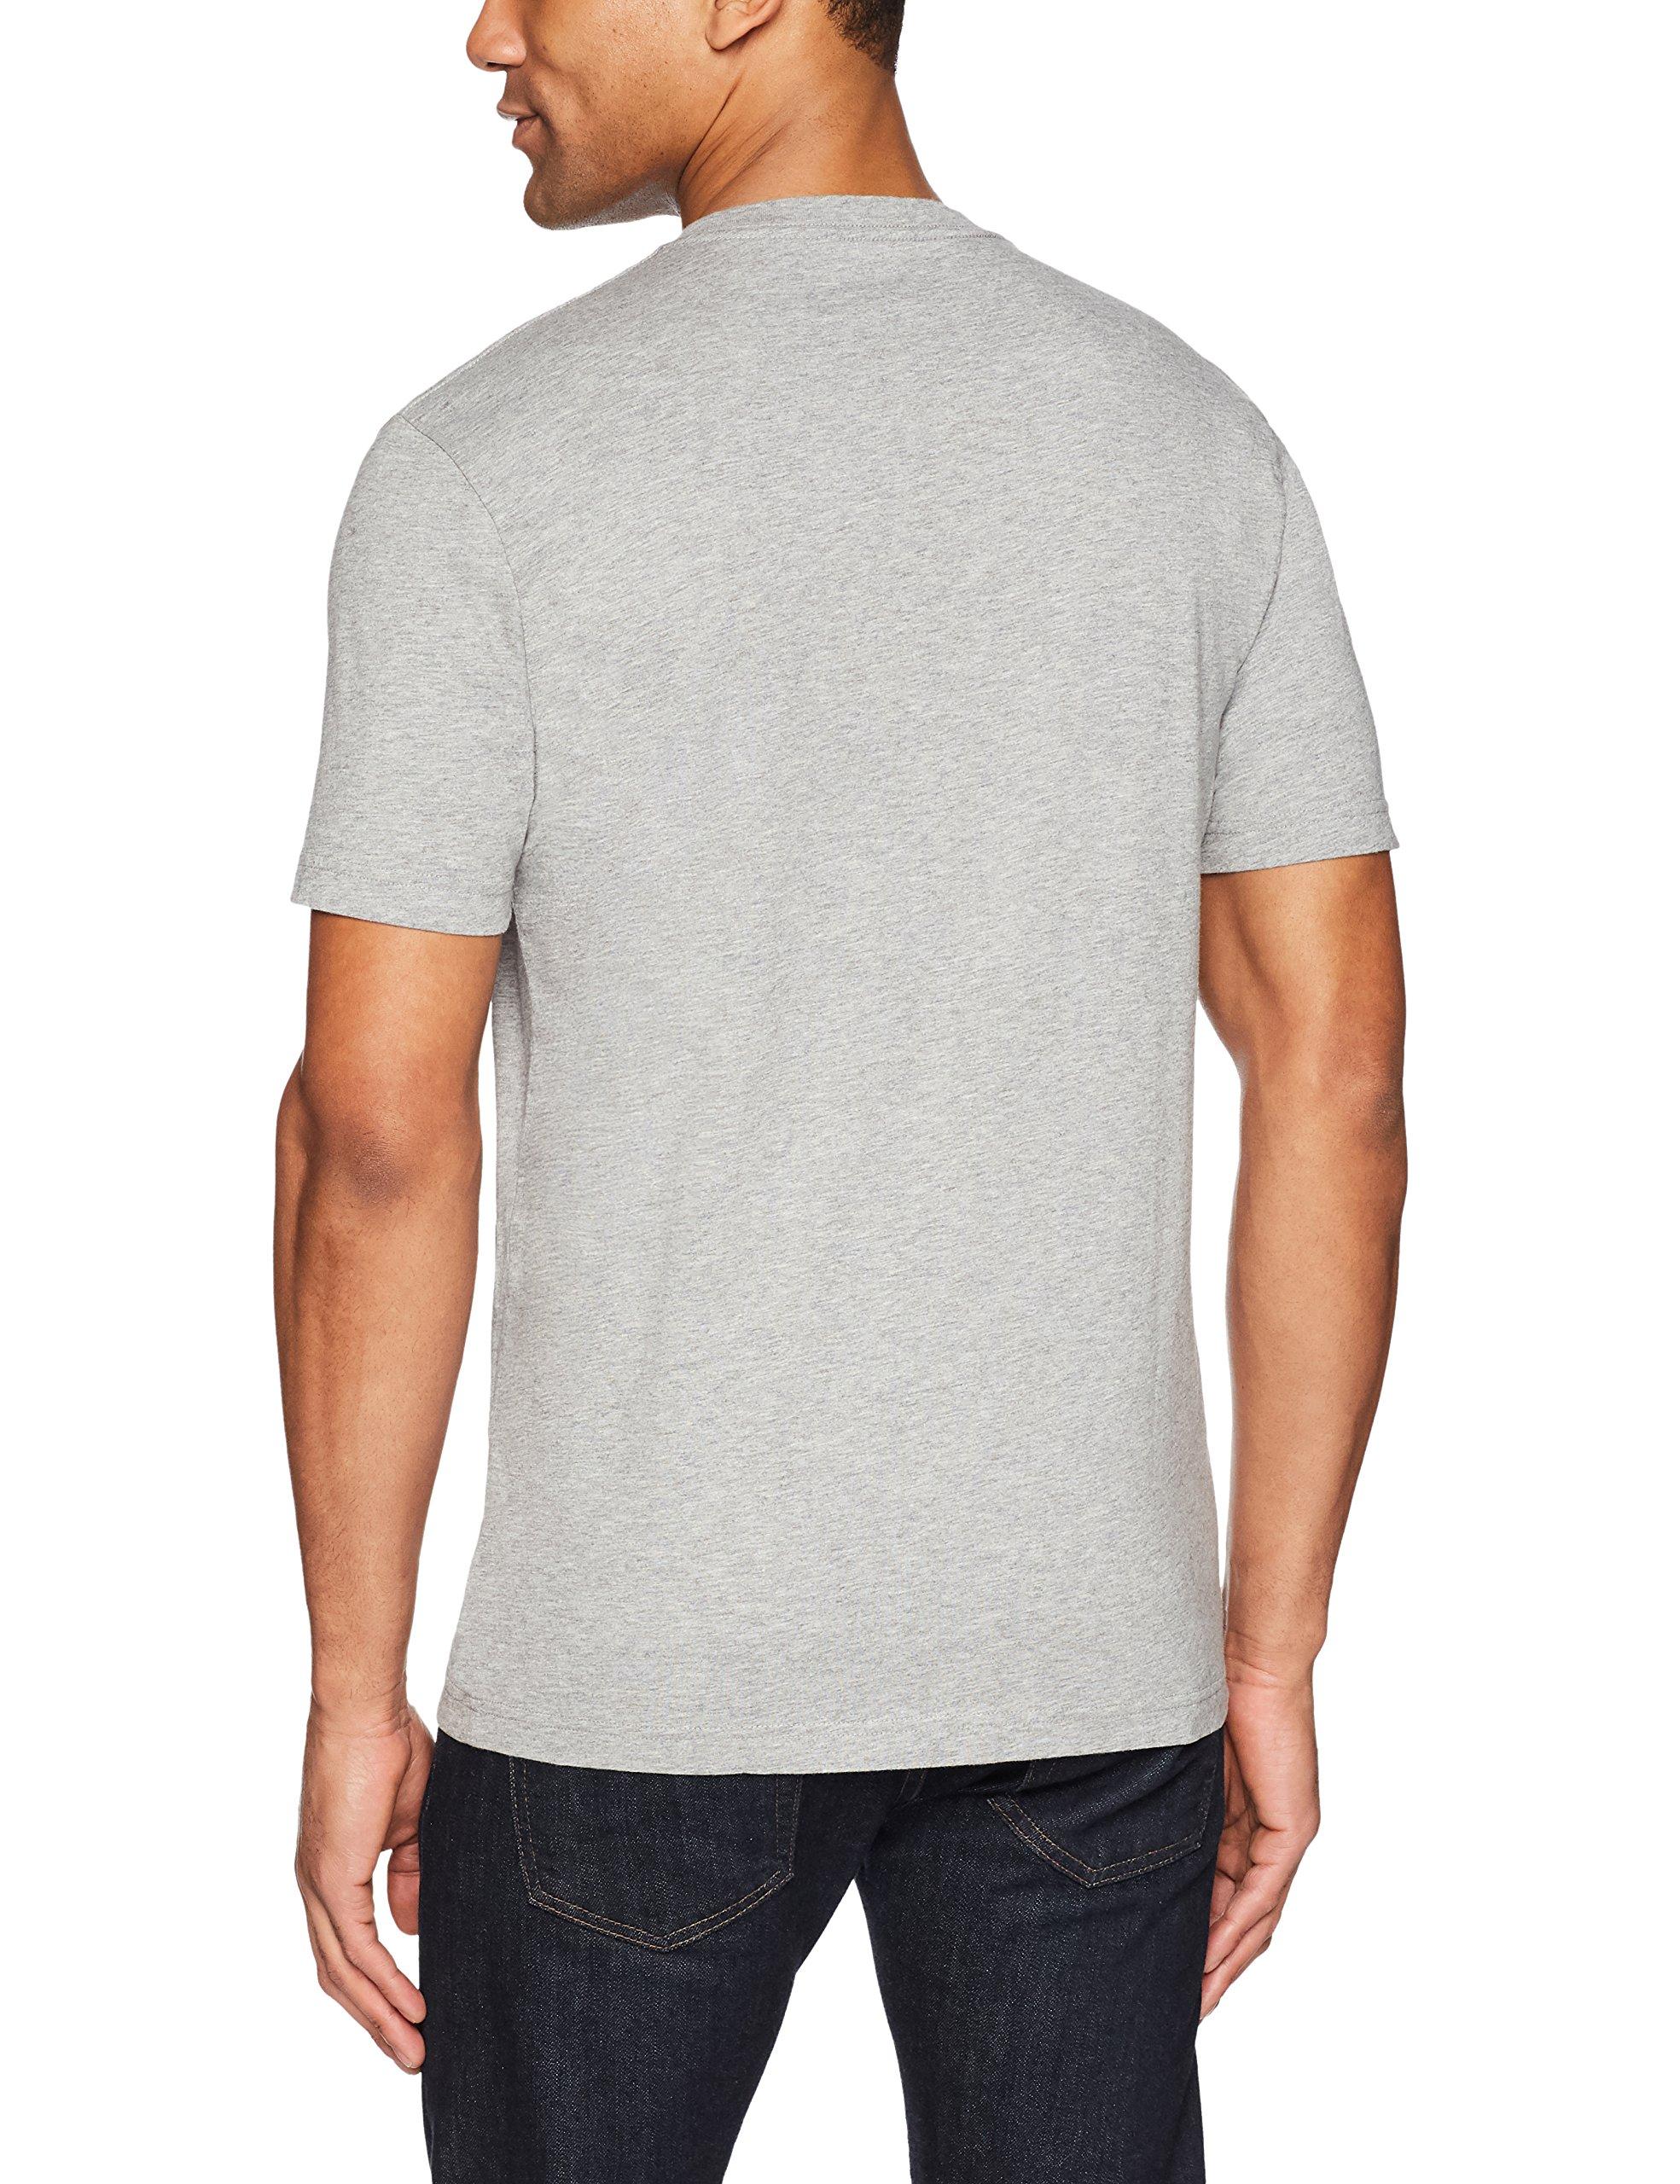 Goodthreads Men's Short-Sleeve V-Neck Cotton T-Shirt, Heather Grey, X-Large by Goodthreads (Image #4)